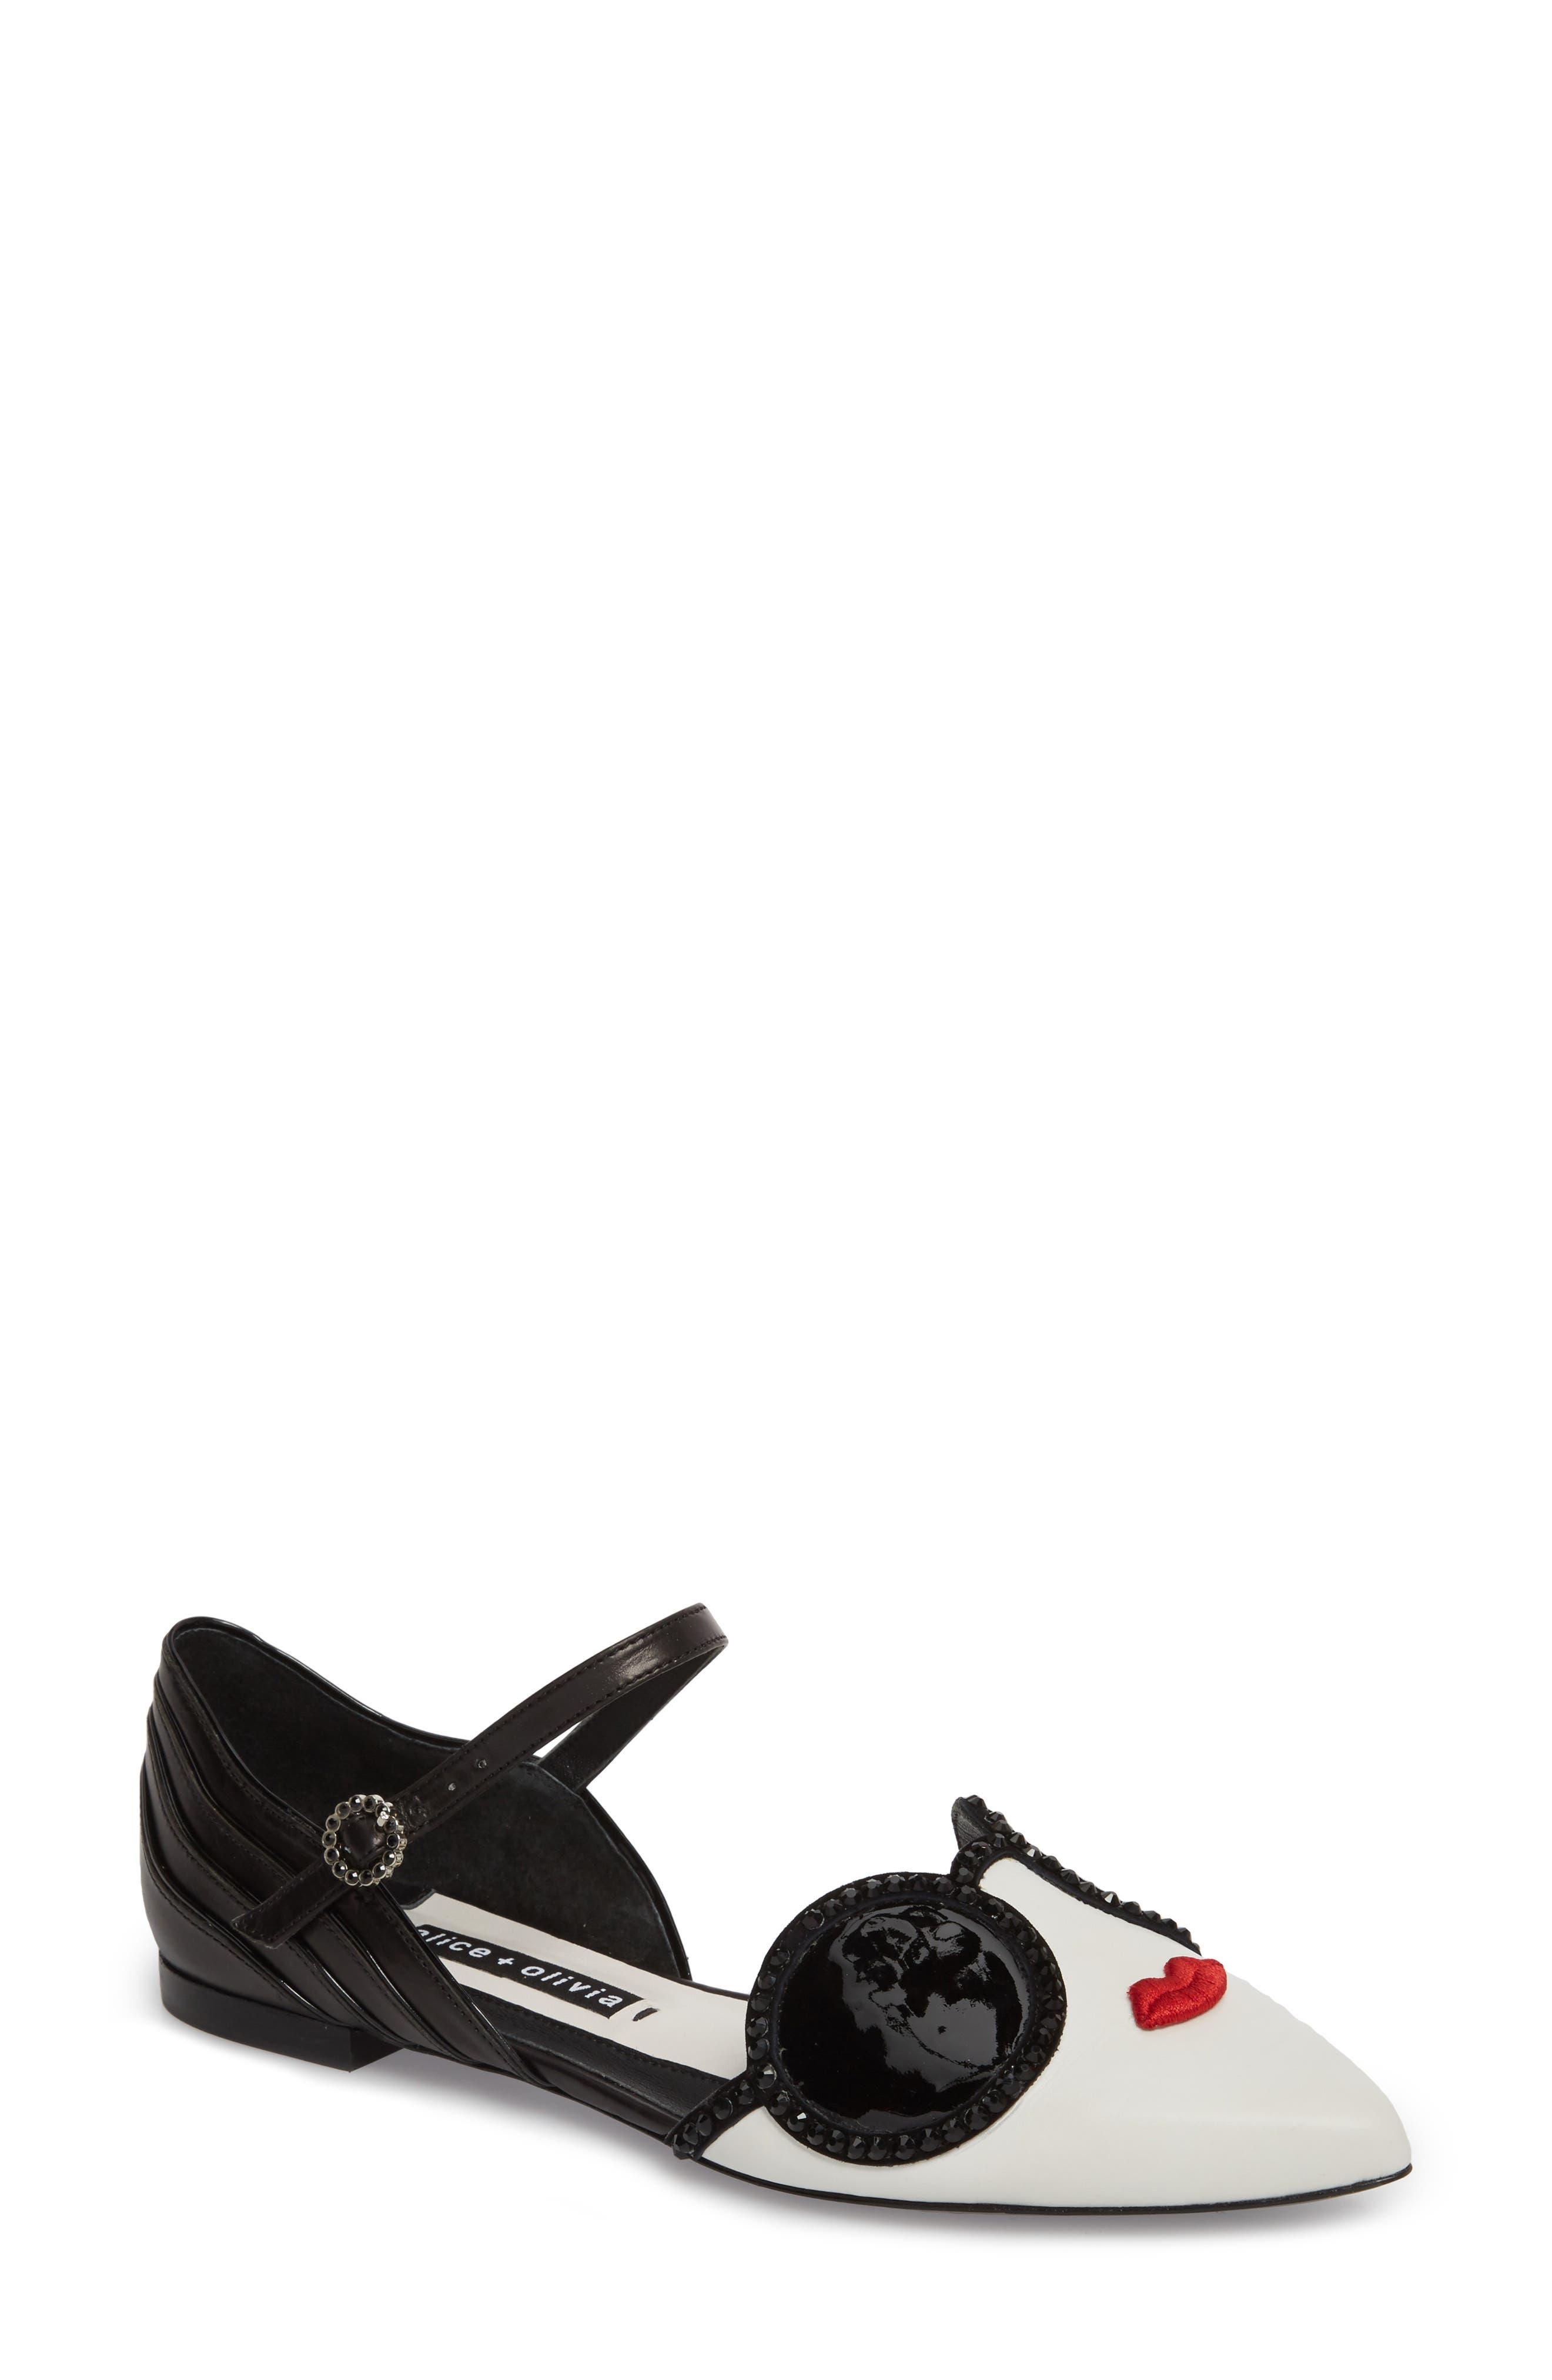 Lexi Embellished Pointy Toe Flat,                         Main,                         color, Bianco/ Black/ Poppy